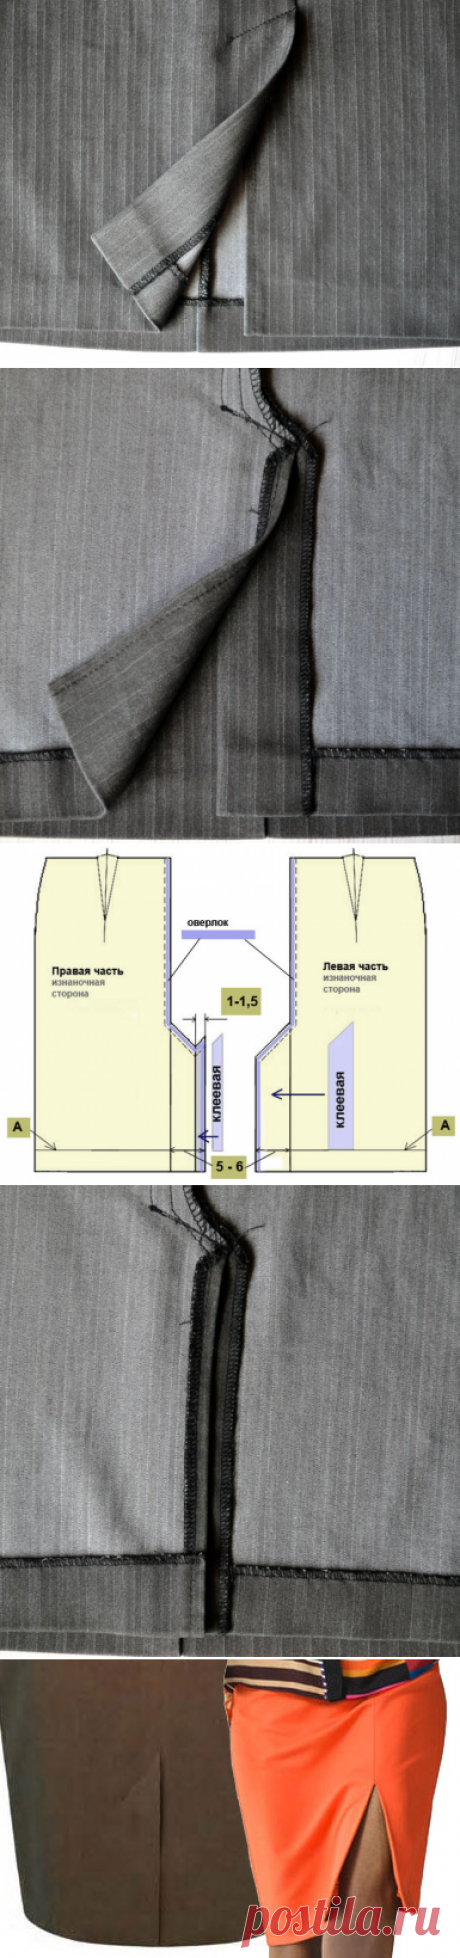 Шлица на юбке   Технология обработки шлицы на юбке